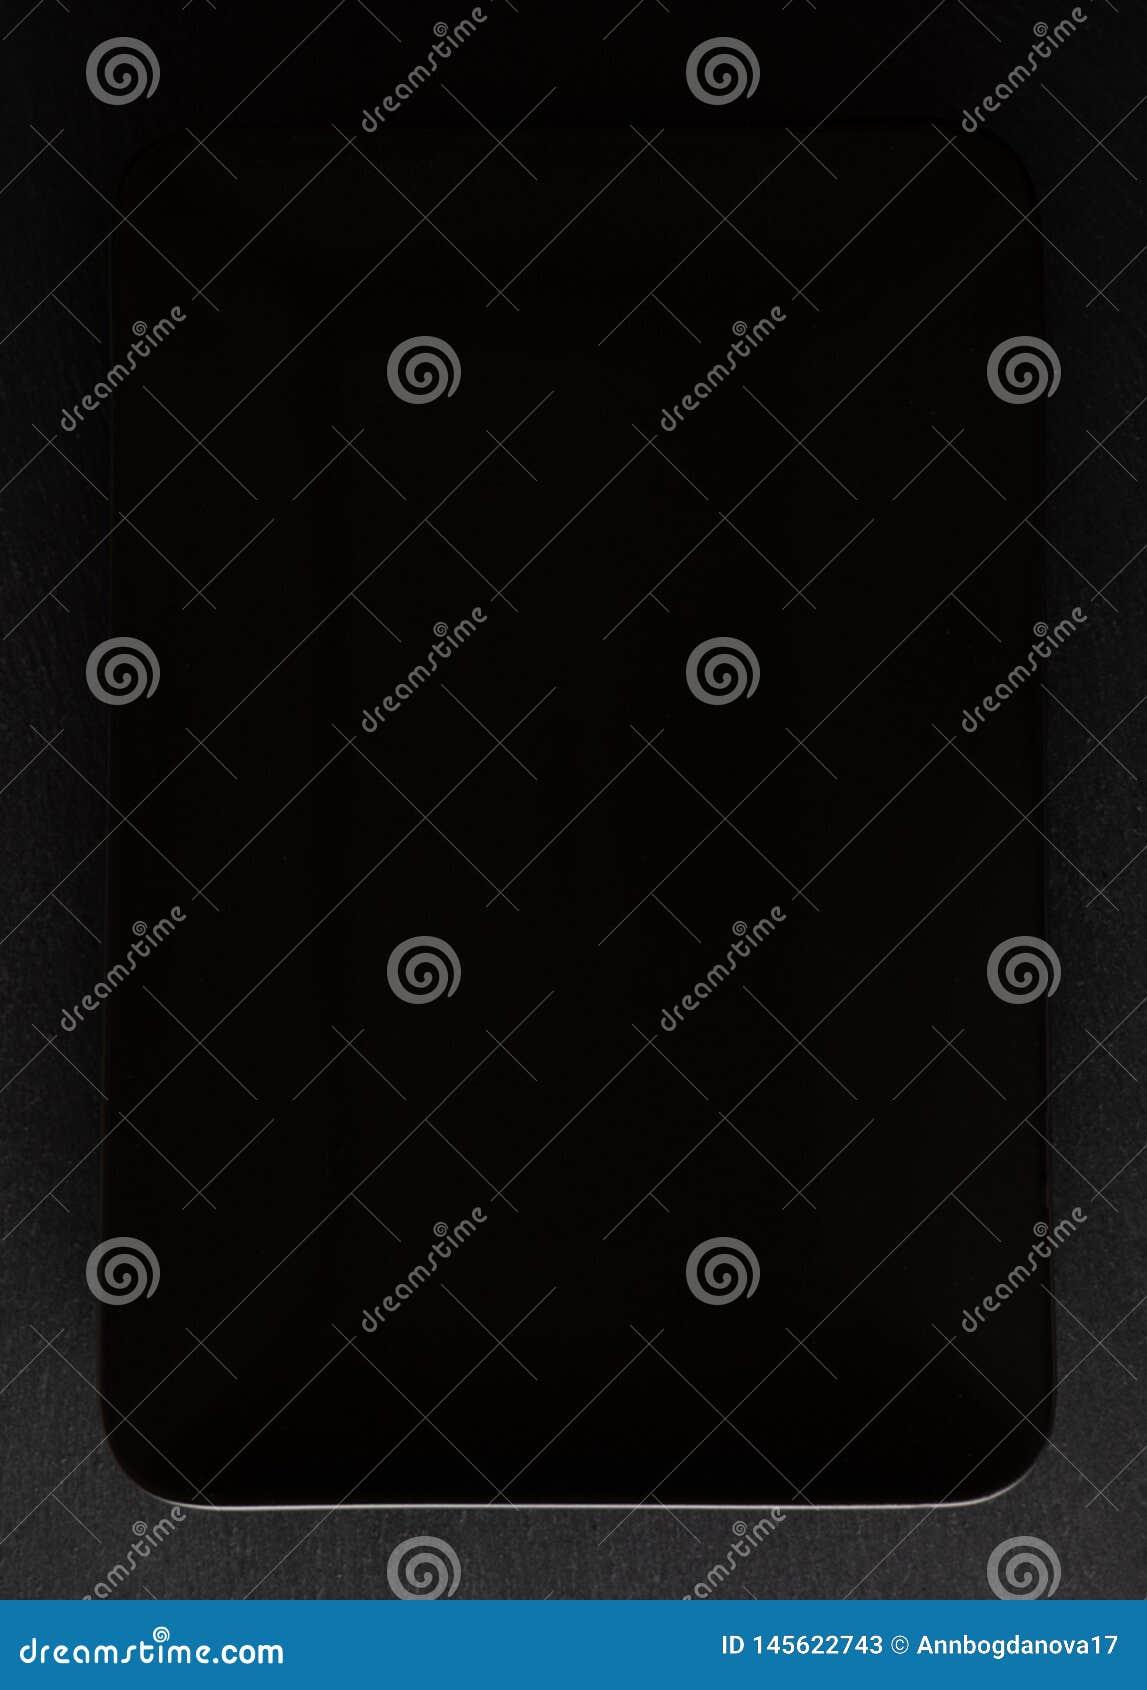 Плита черного цвета как предпосылка надписи